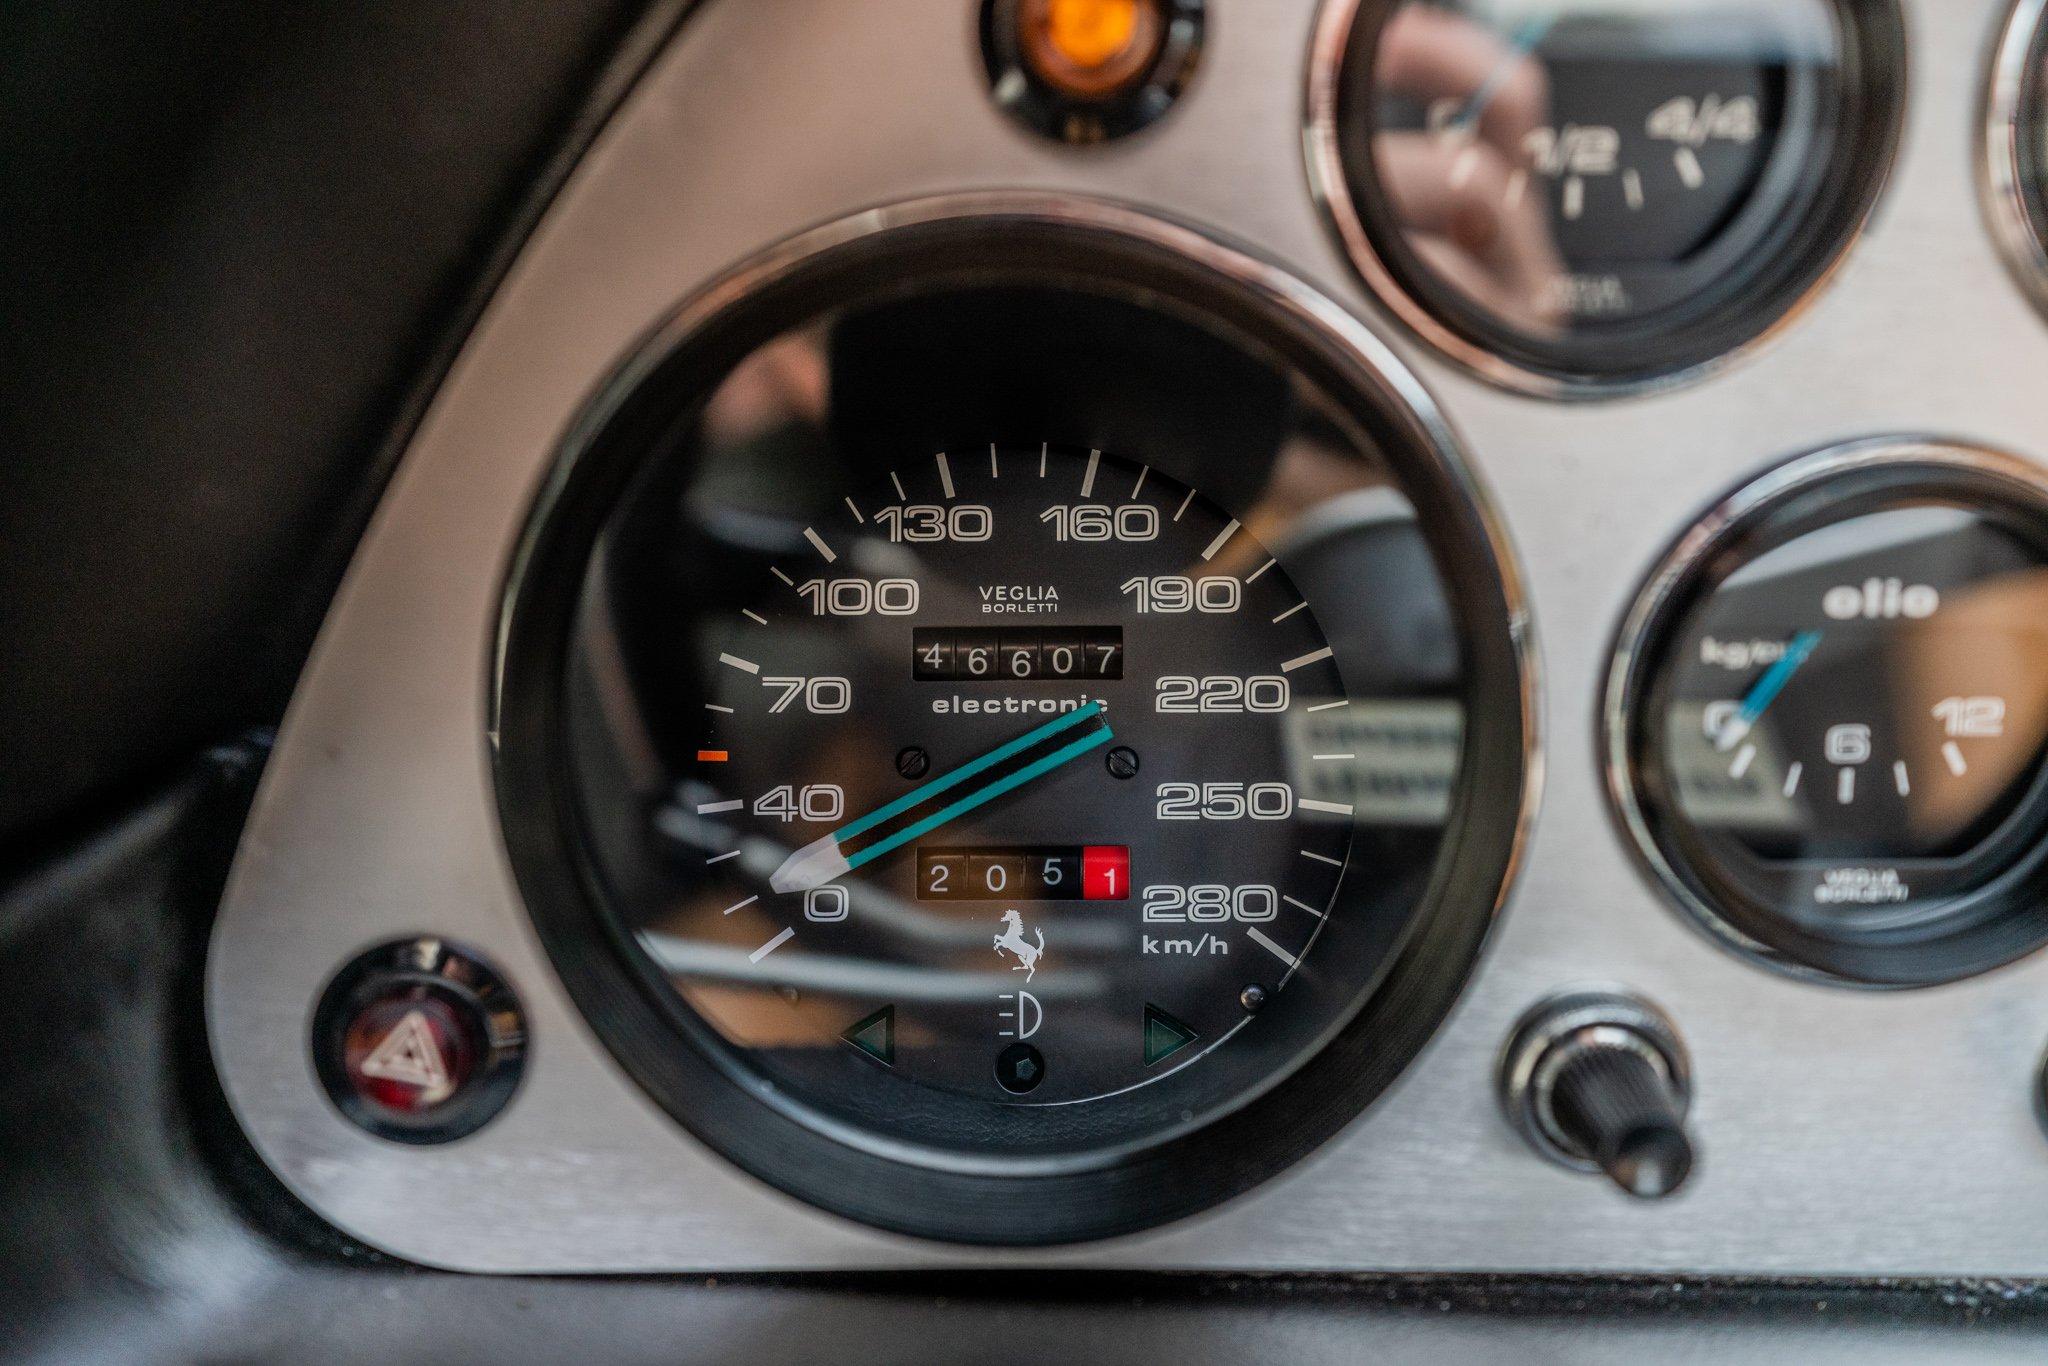 1976 Ferrari 308 GTB Vetroresina (Fiberglass) #19377